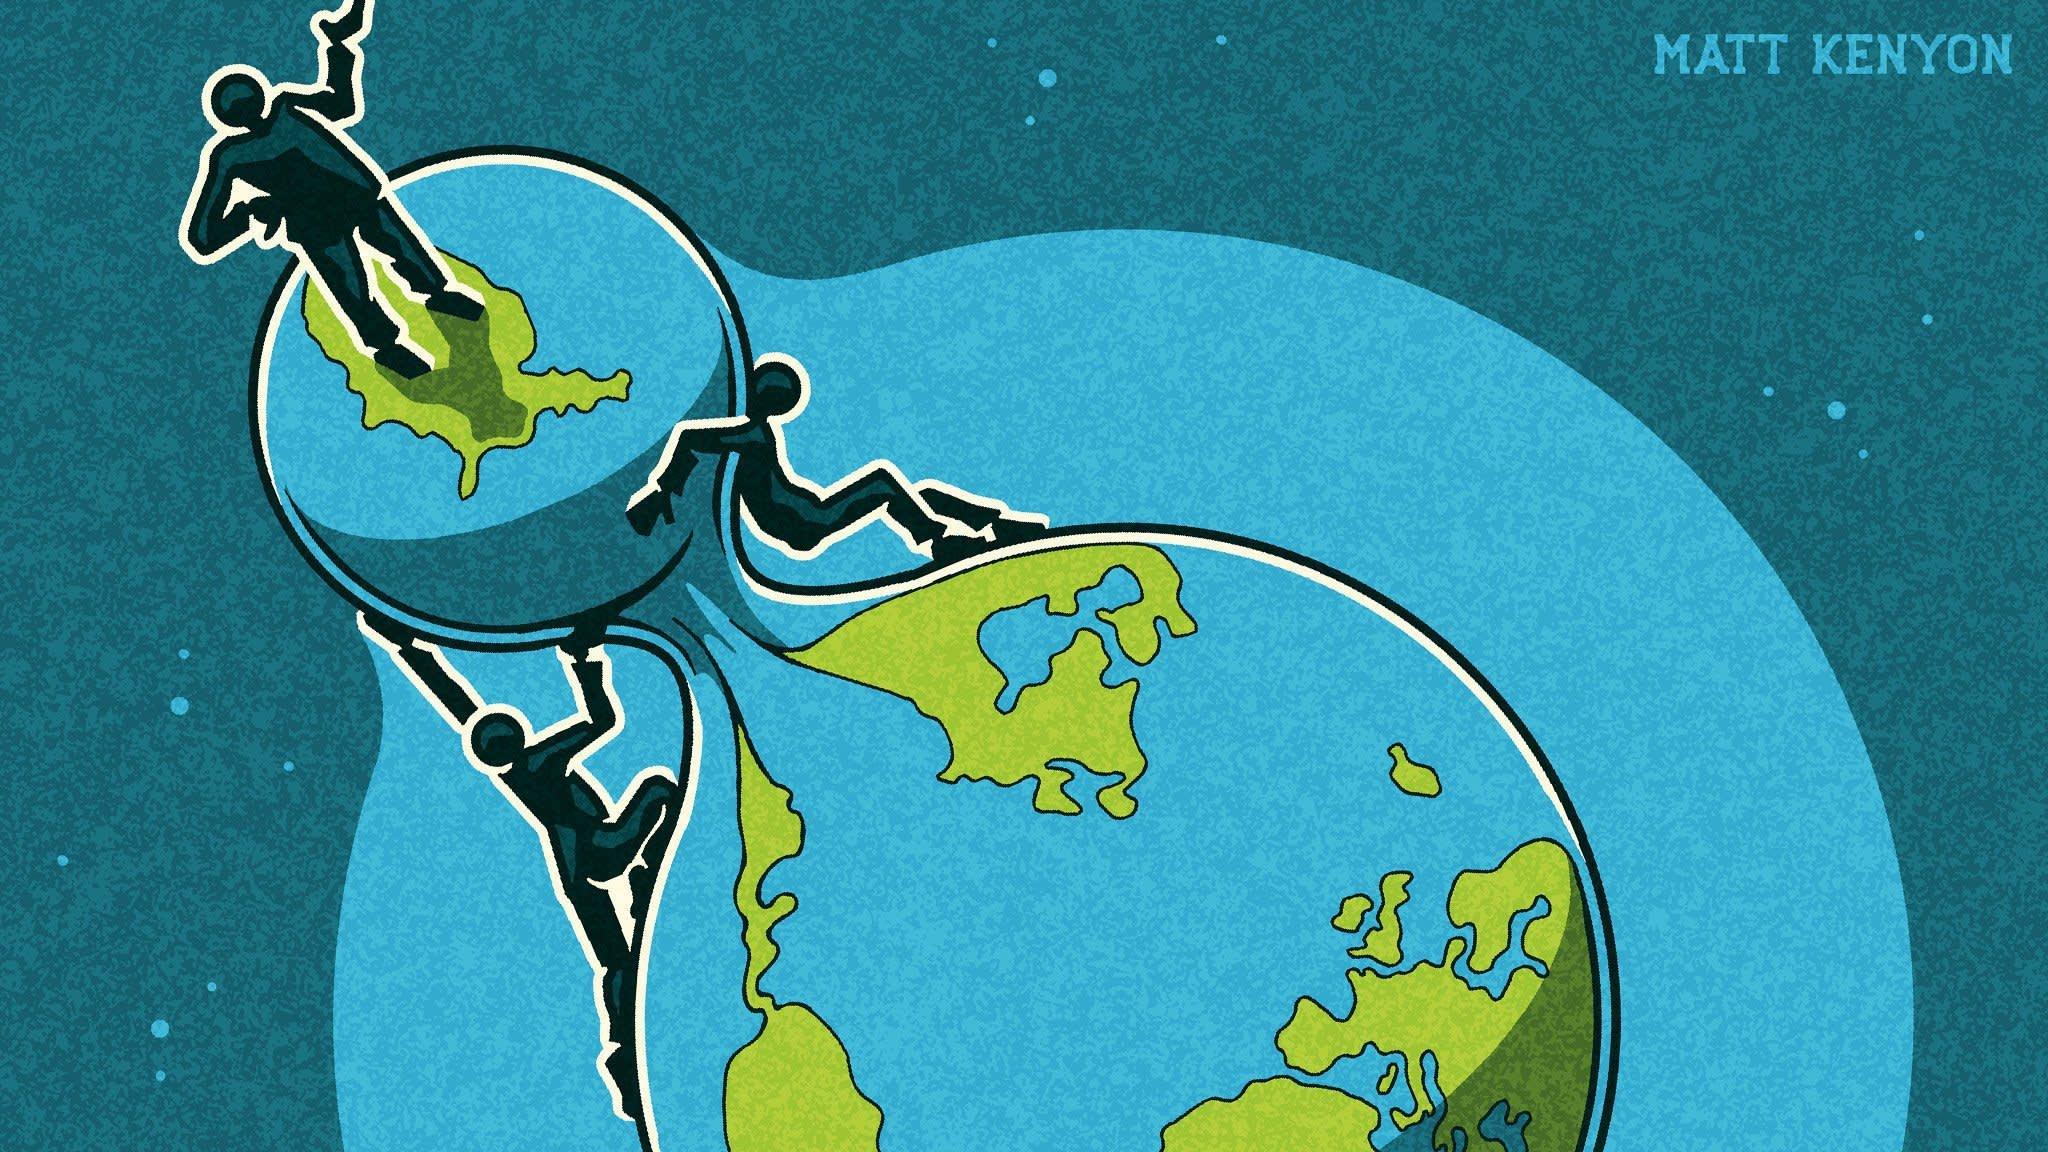 Corporate elites are overlooking deglobalisation